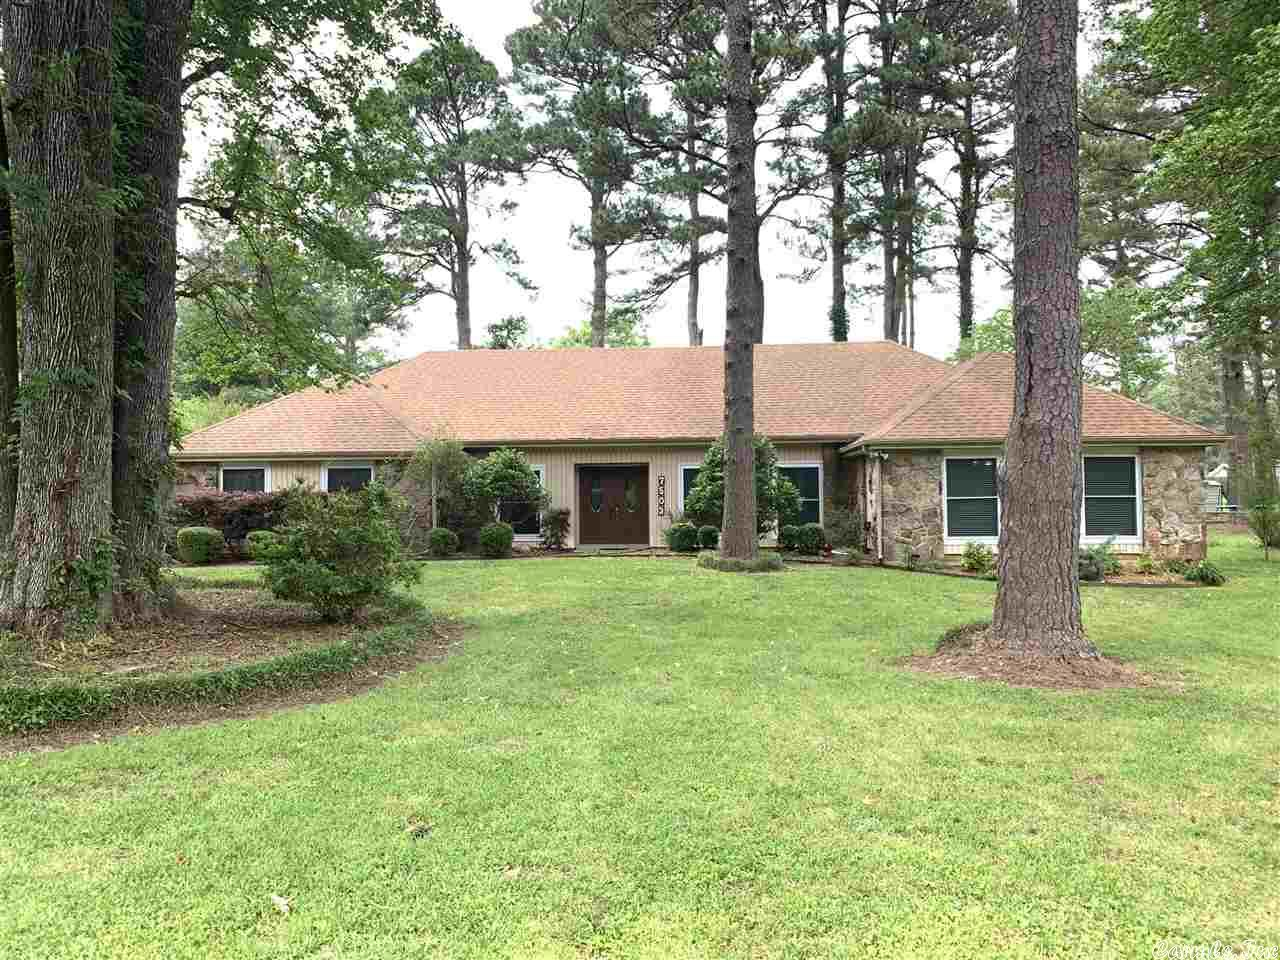 7503 S Pinewood, Pine Bluff, AR 71603